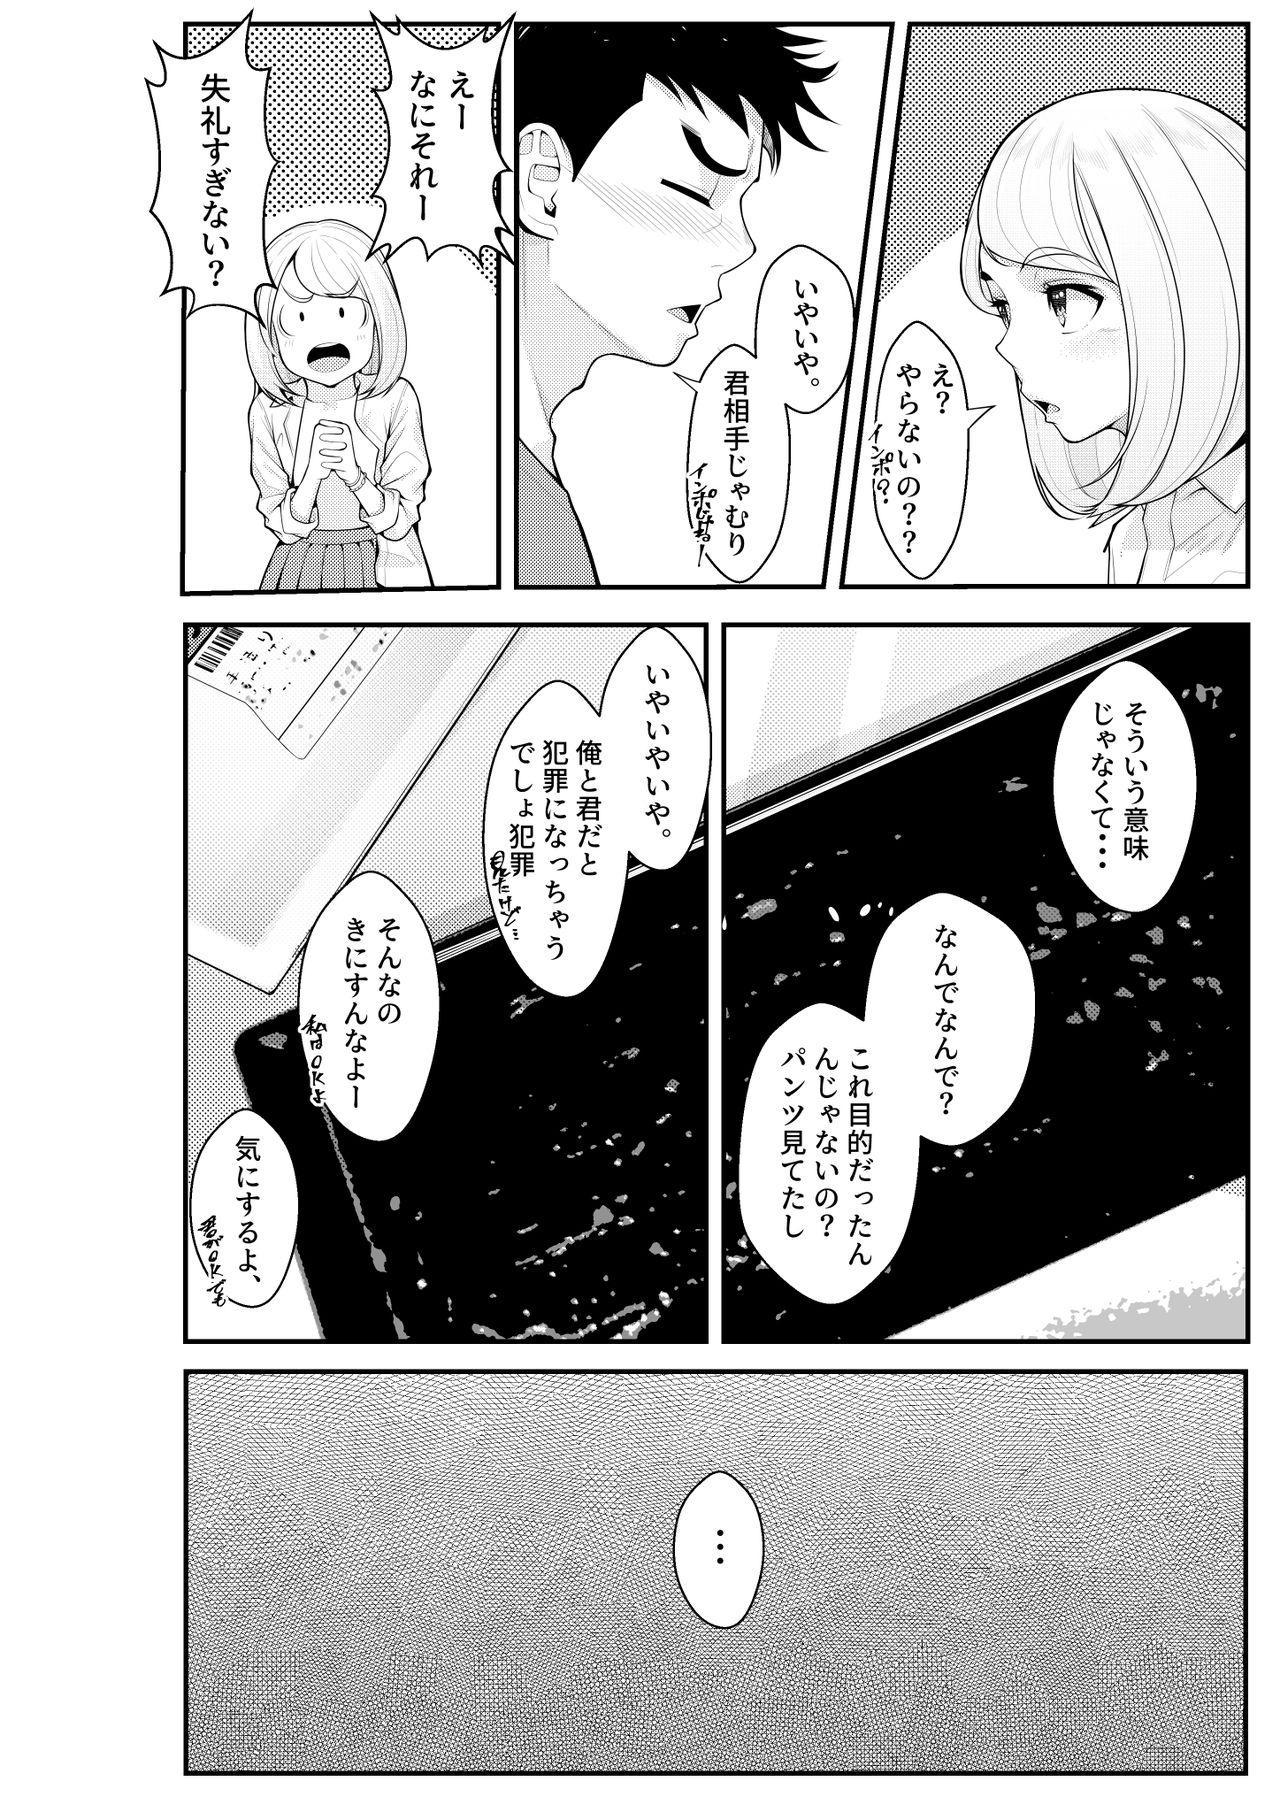 Iede Gal o Hirottara Harem ni Natta Hanashi 11